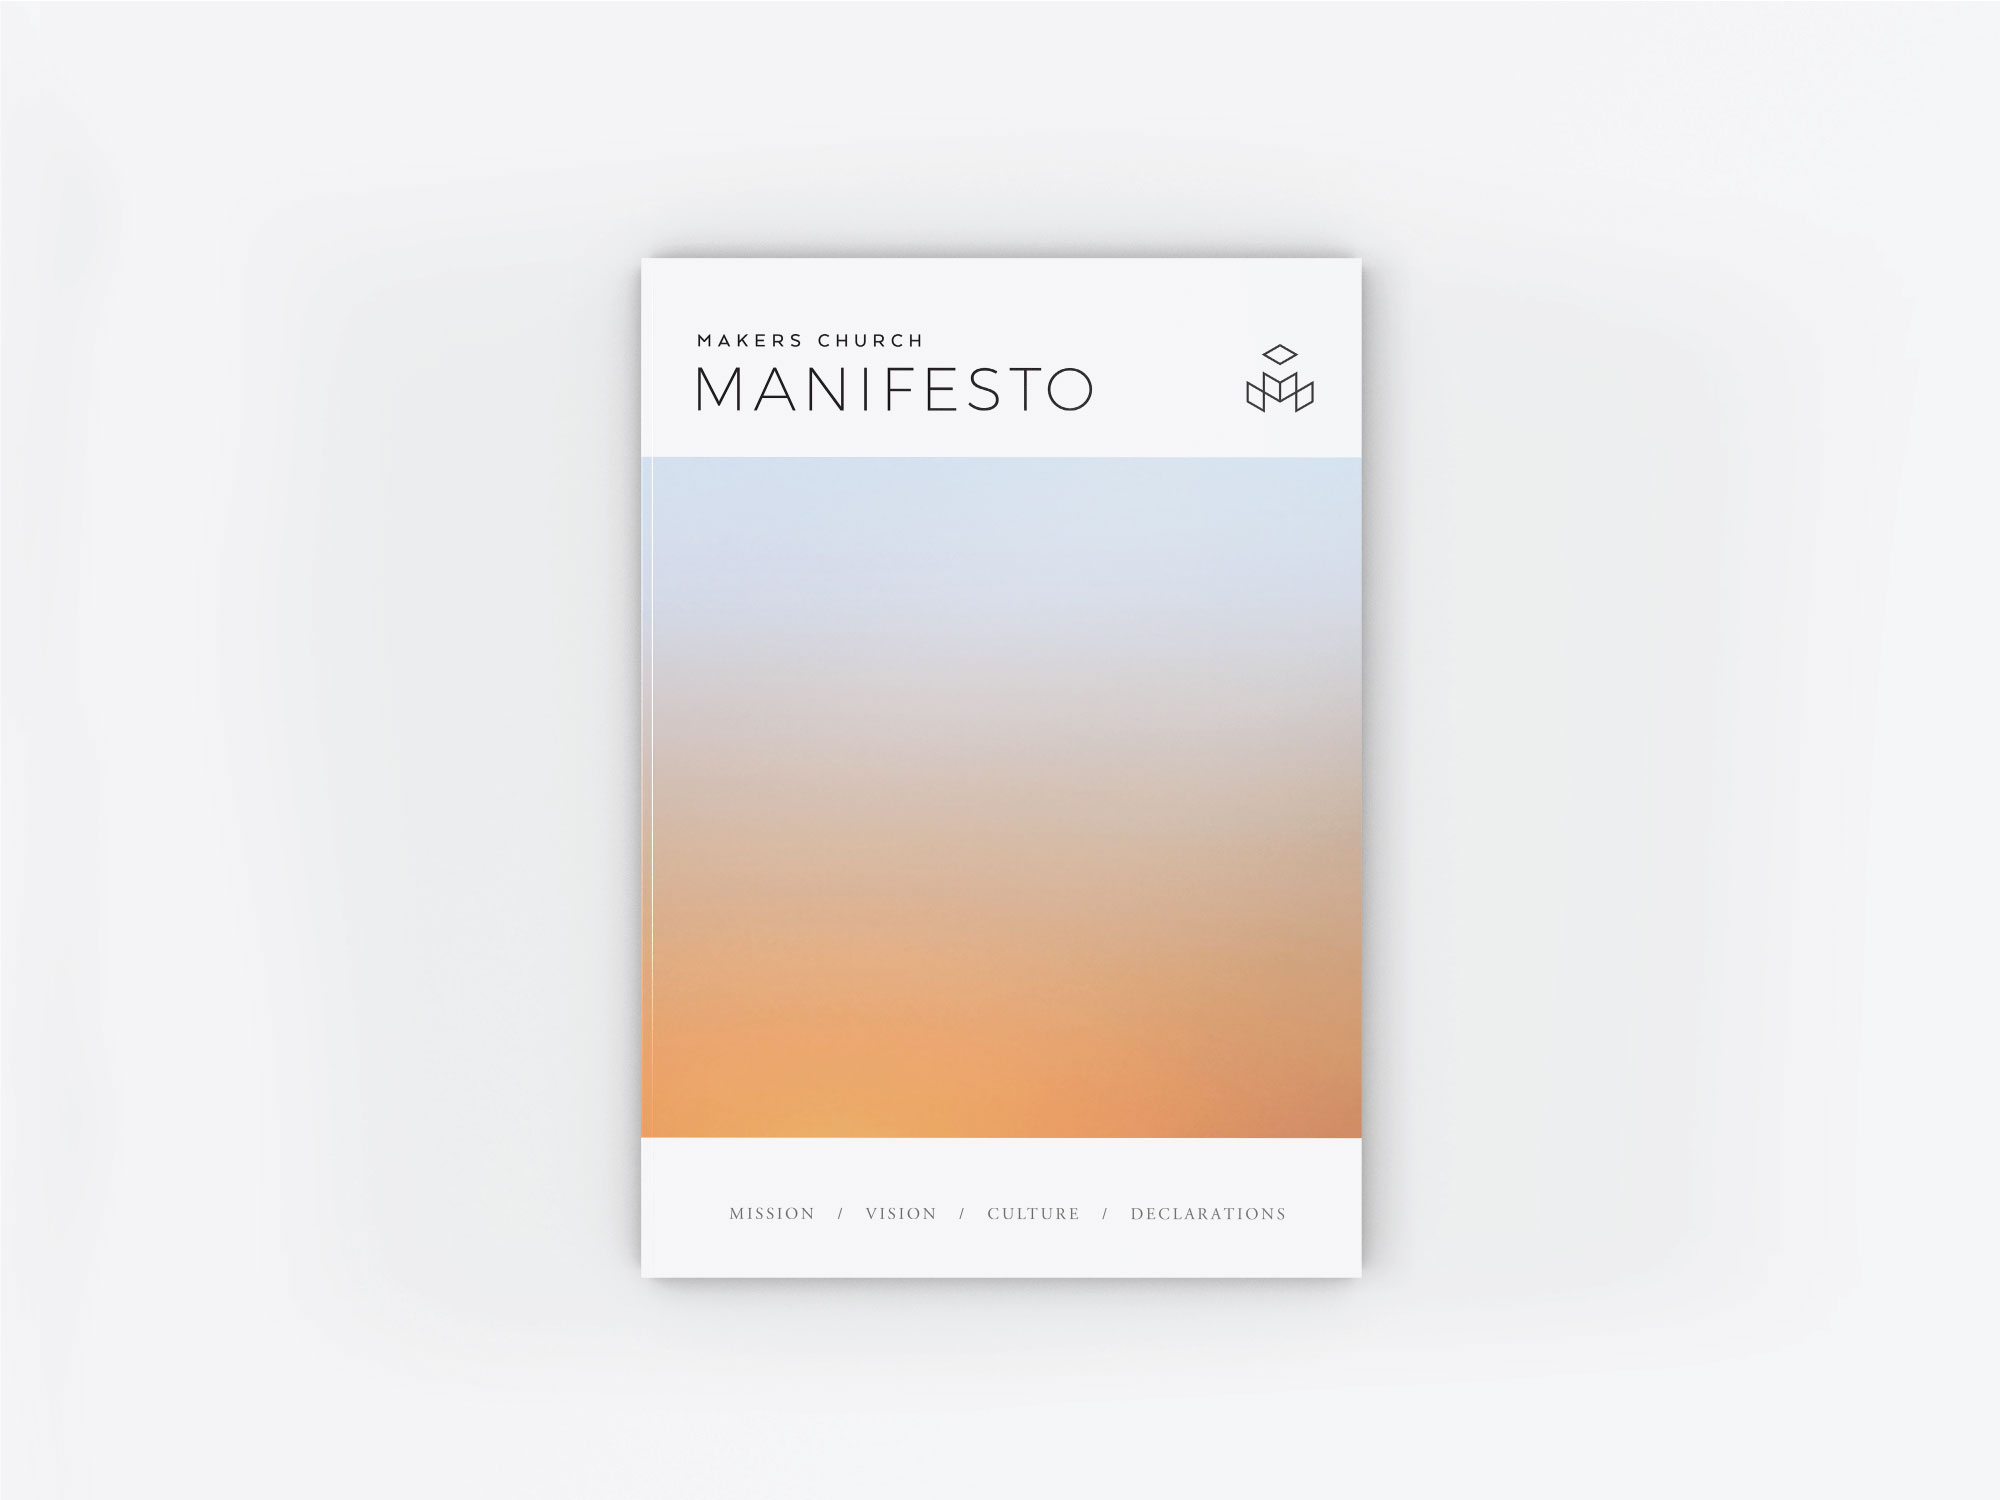 Makers-Manifesto_1.jpg